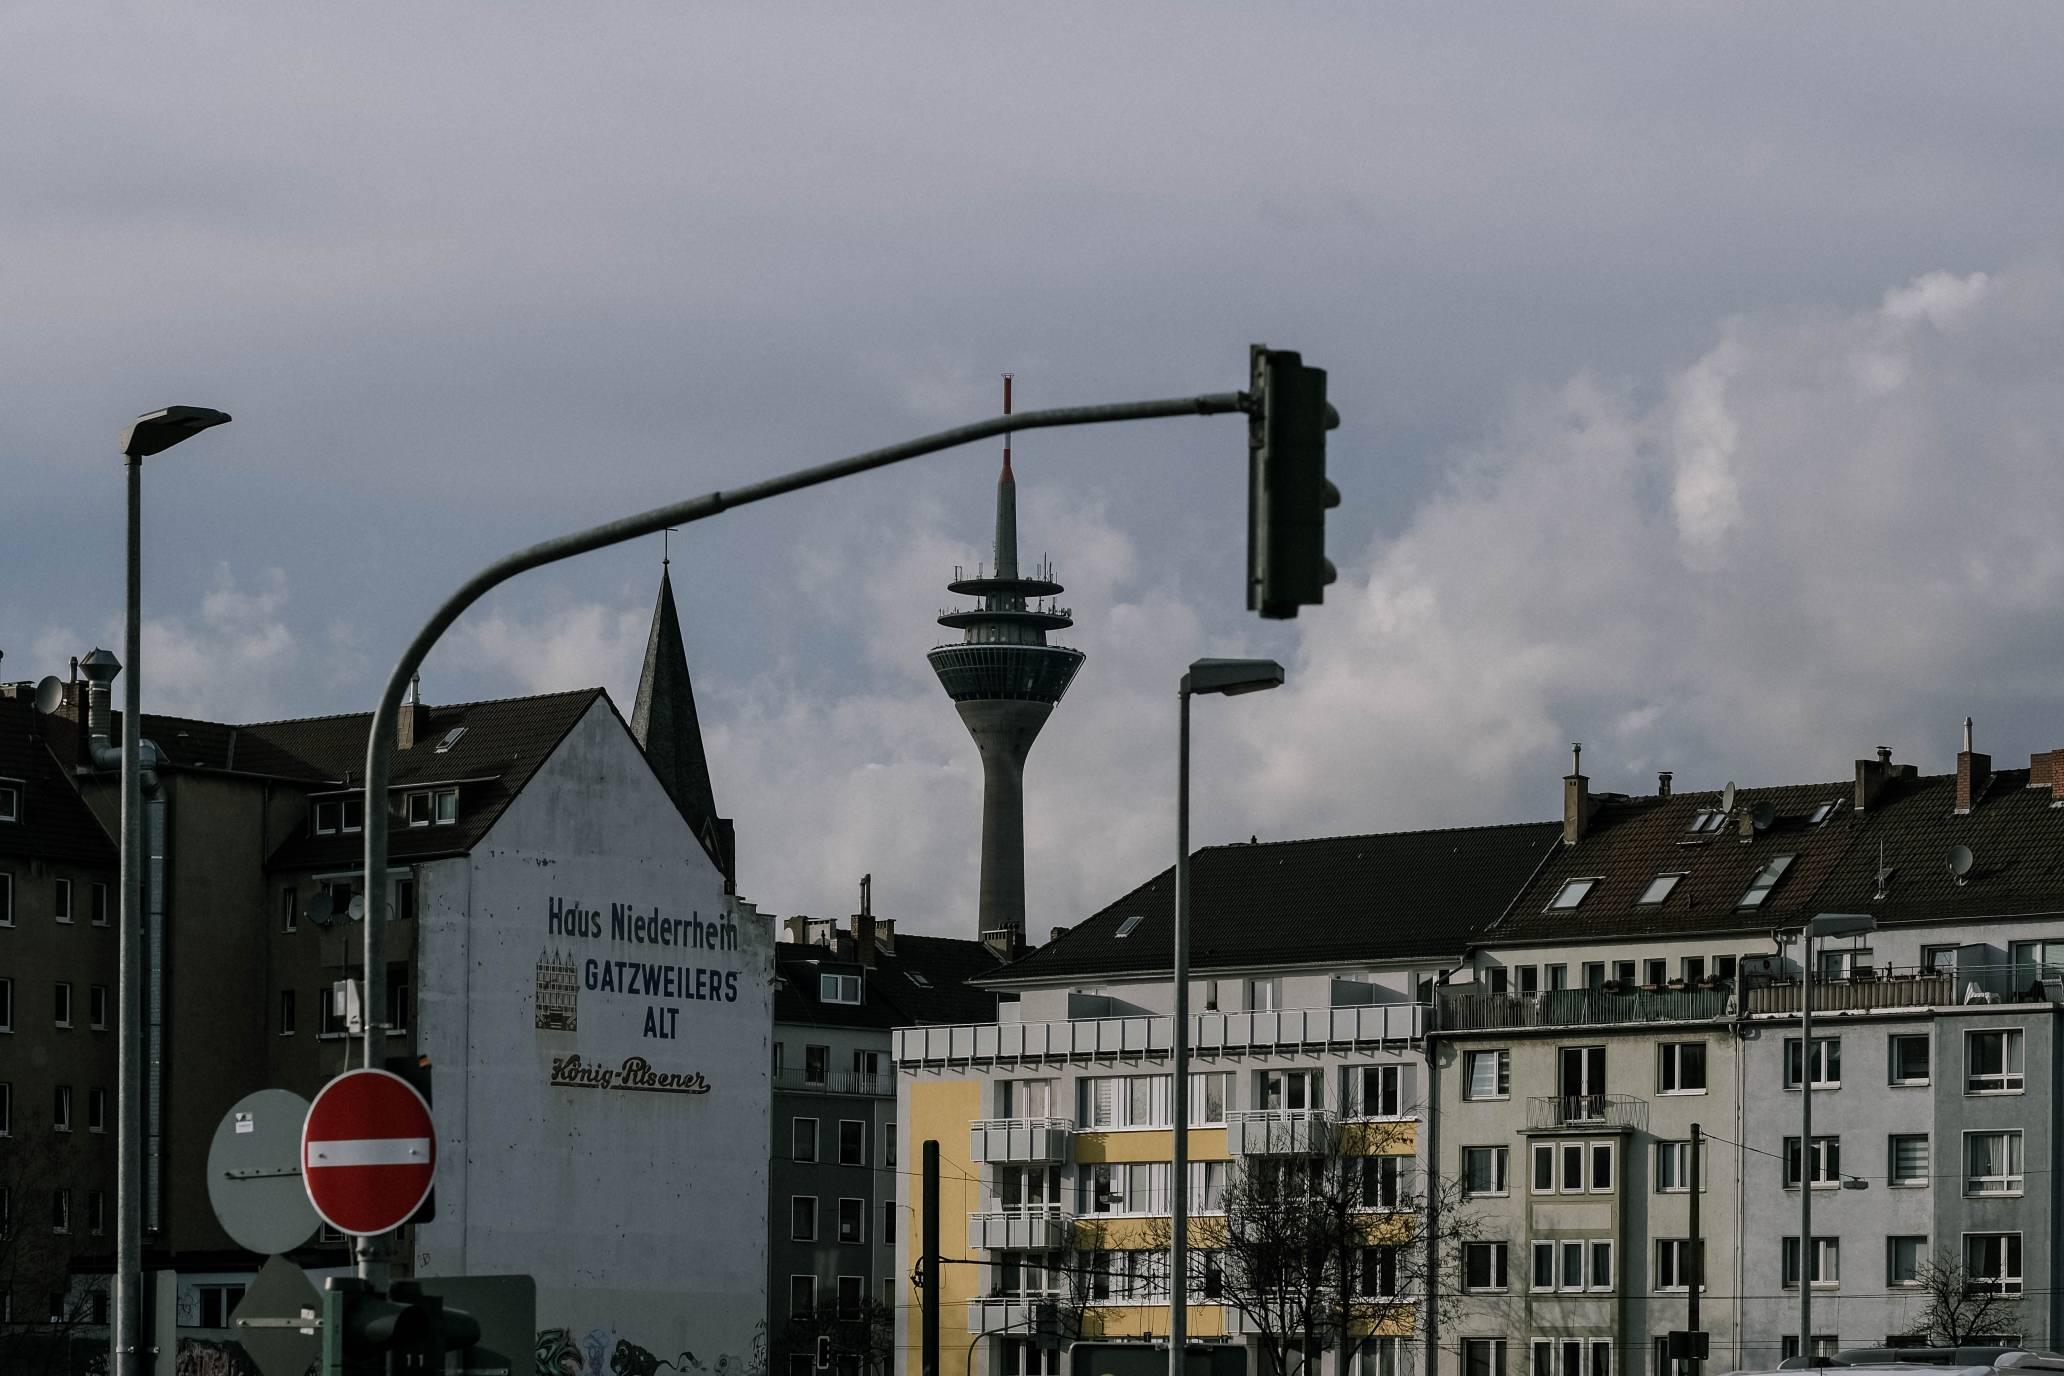 Whore Bad König